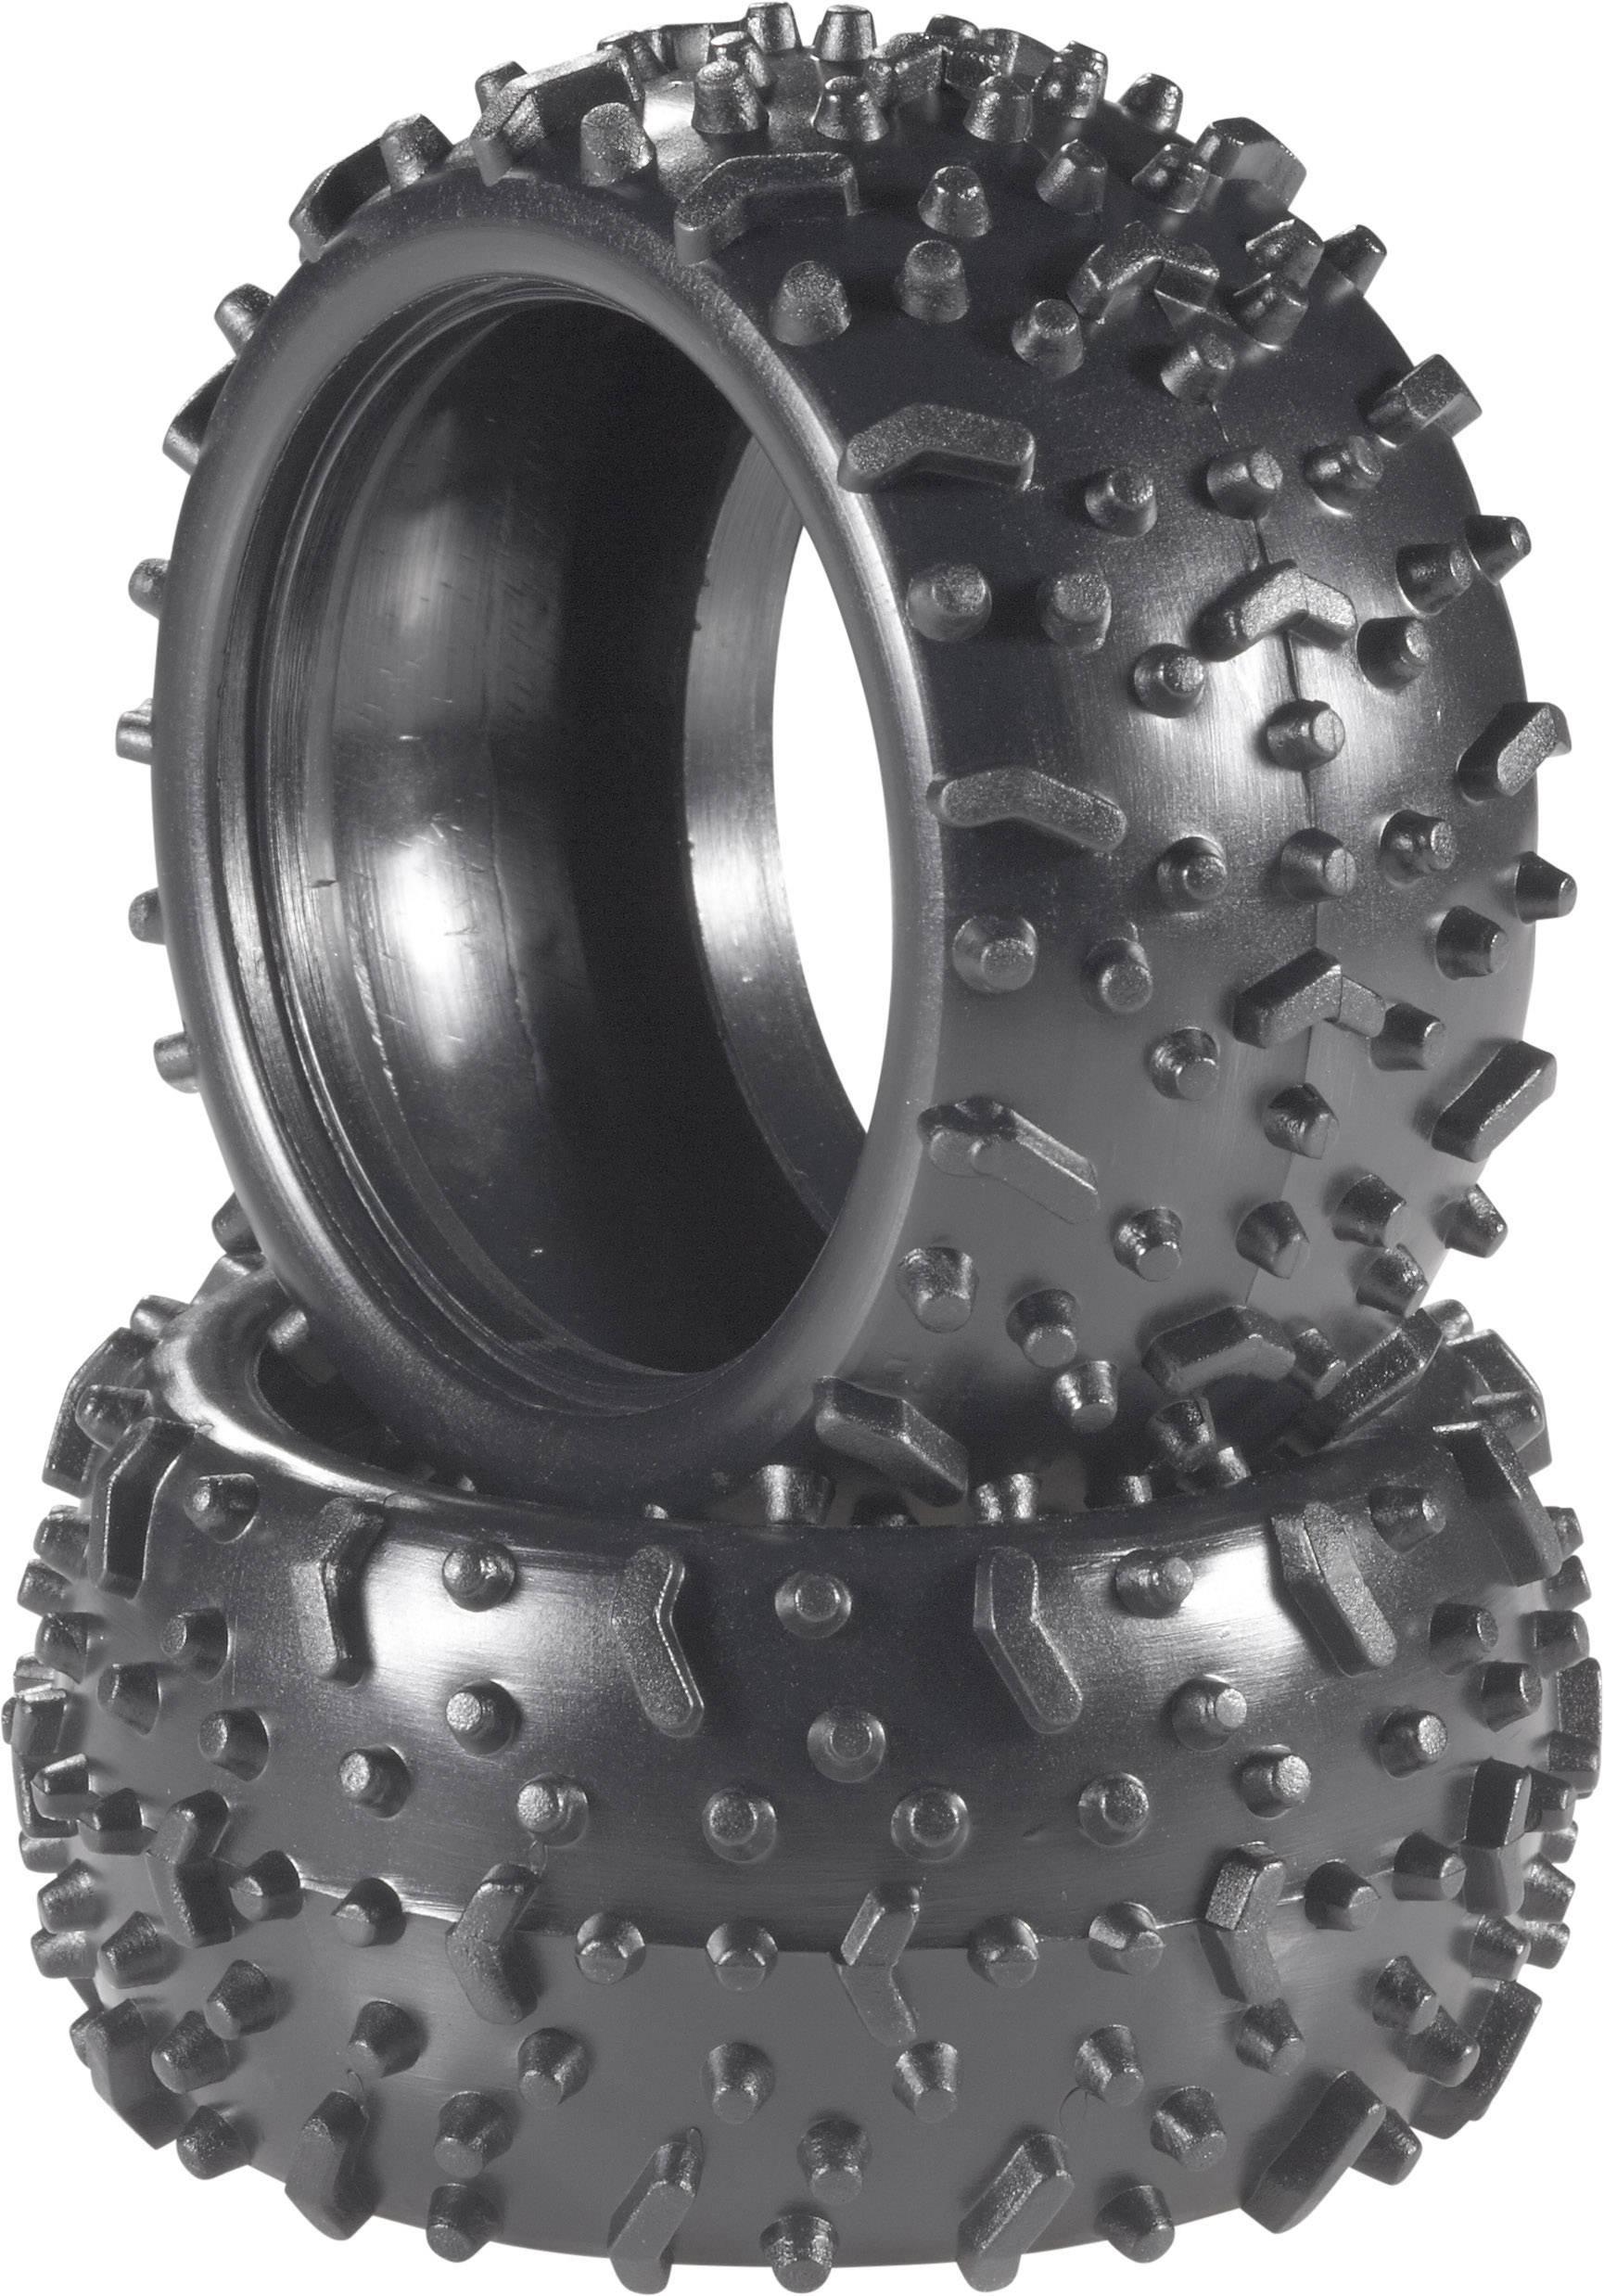 Pneumatiky Extreme Reely CB3691 pre buggy, 83 mm, 1:10, 2 ks